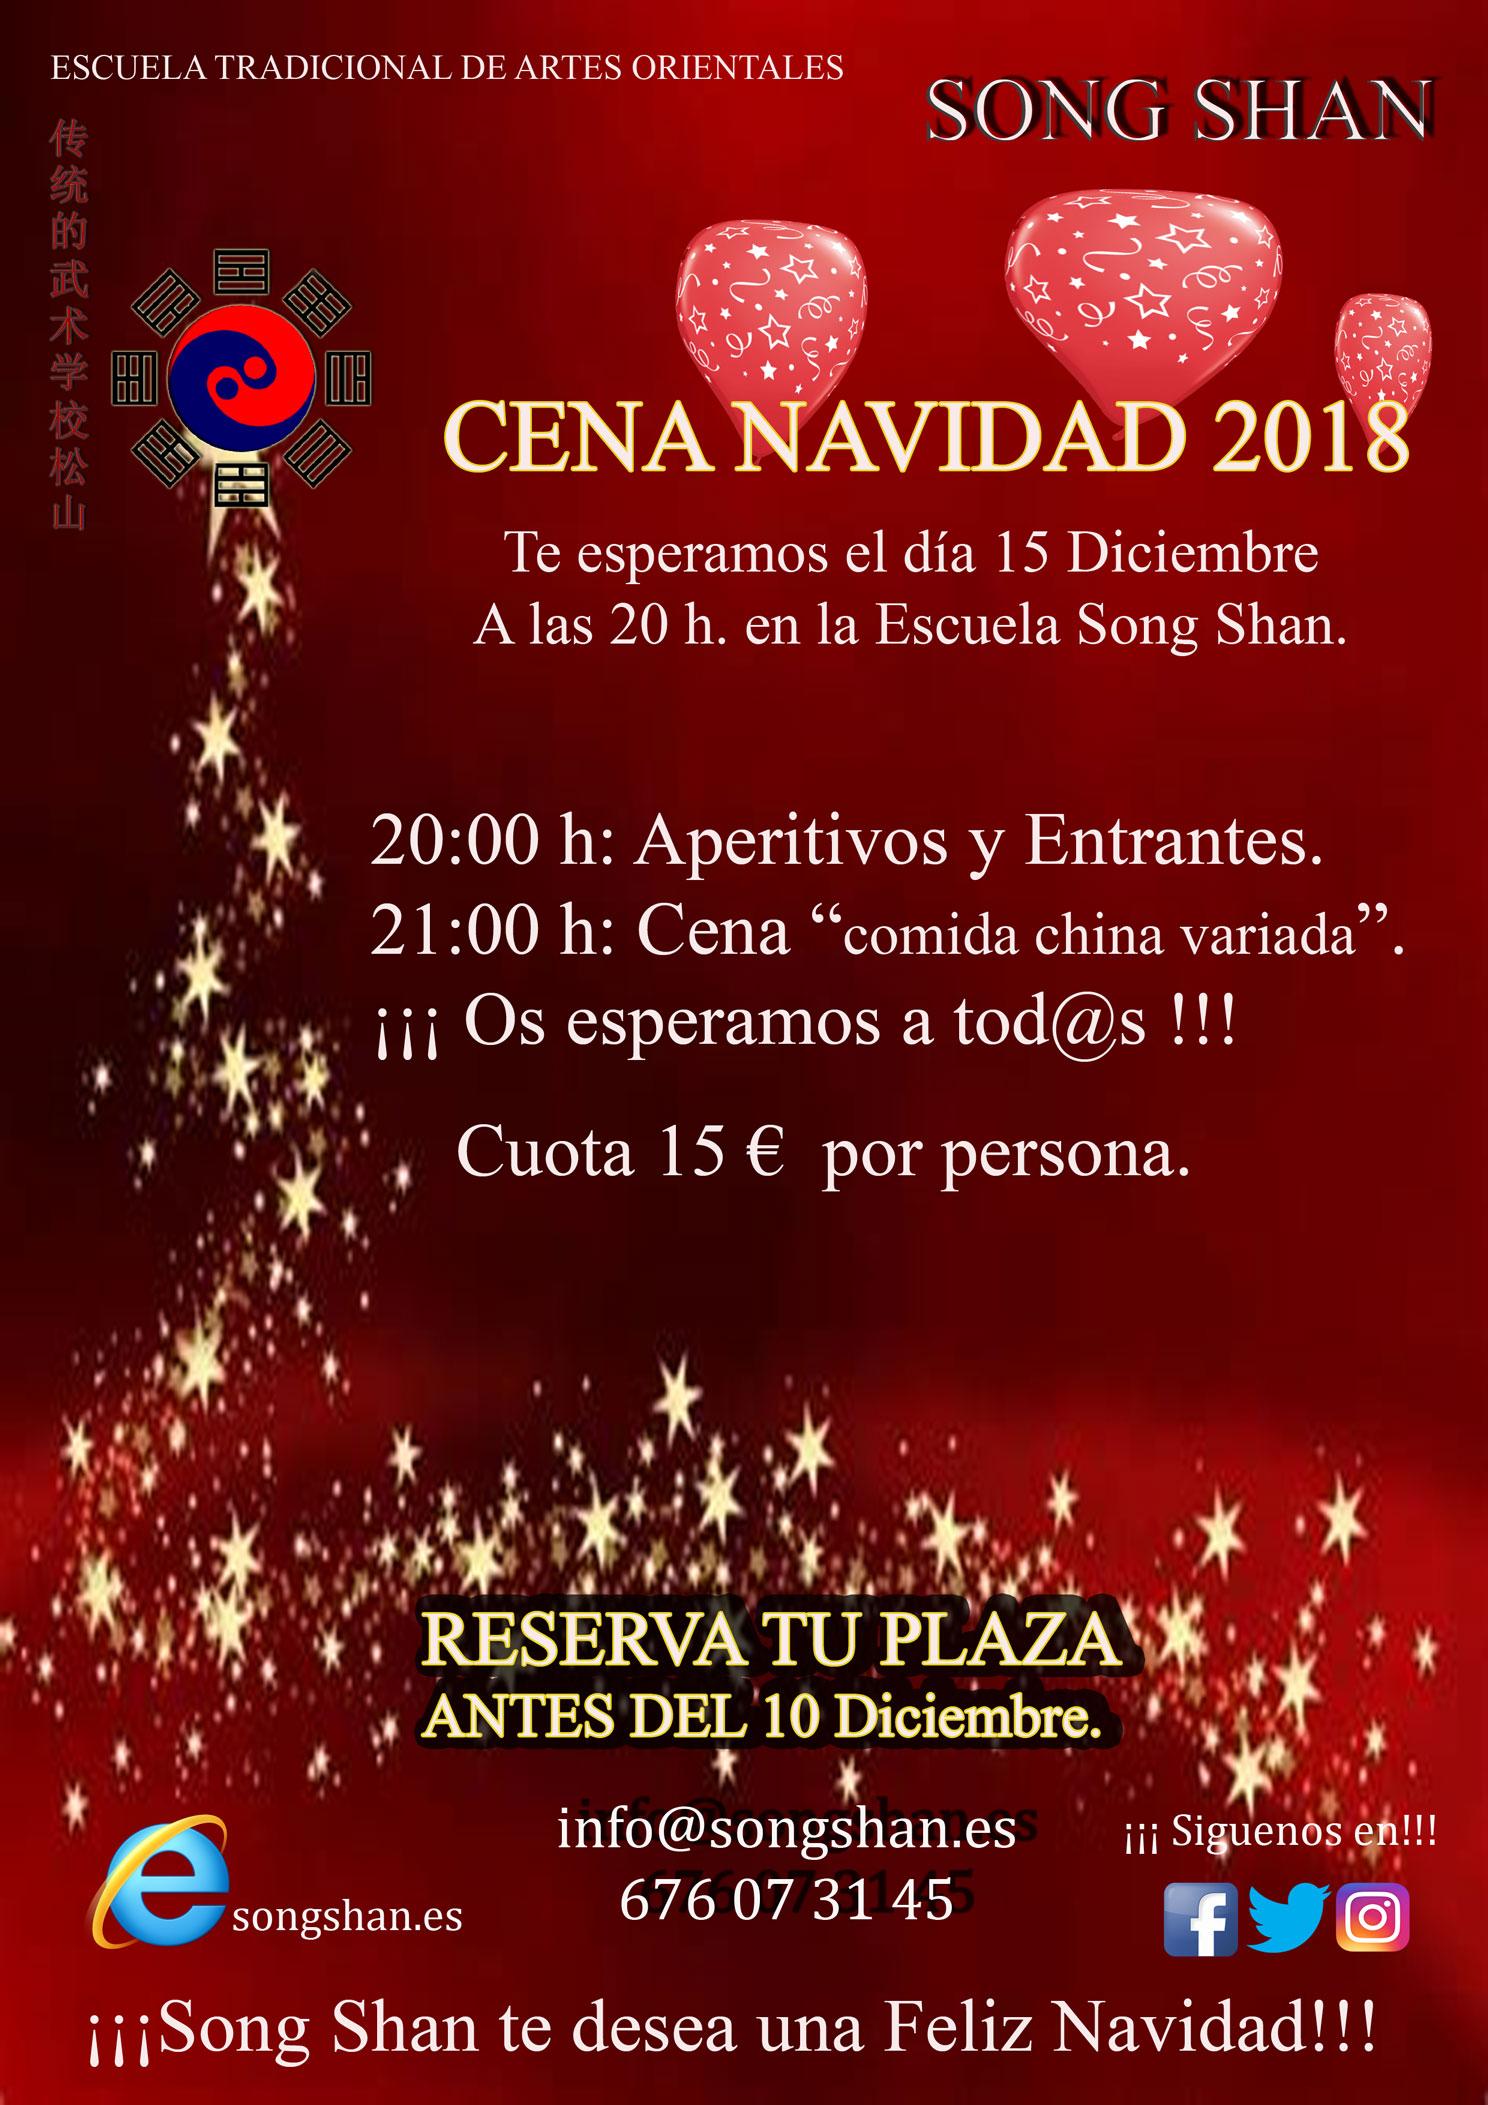 Cena navidad 2018